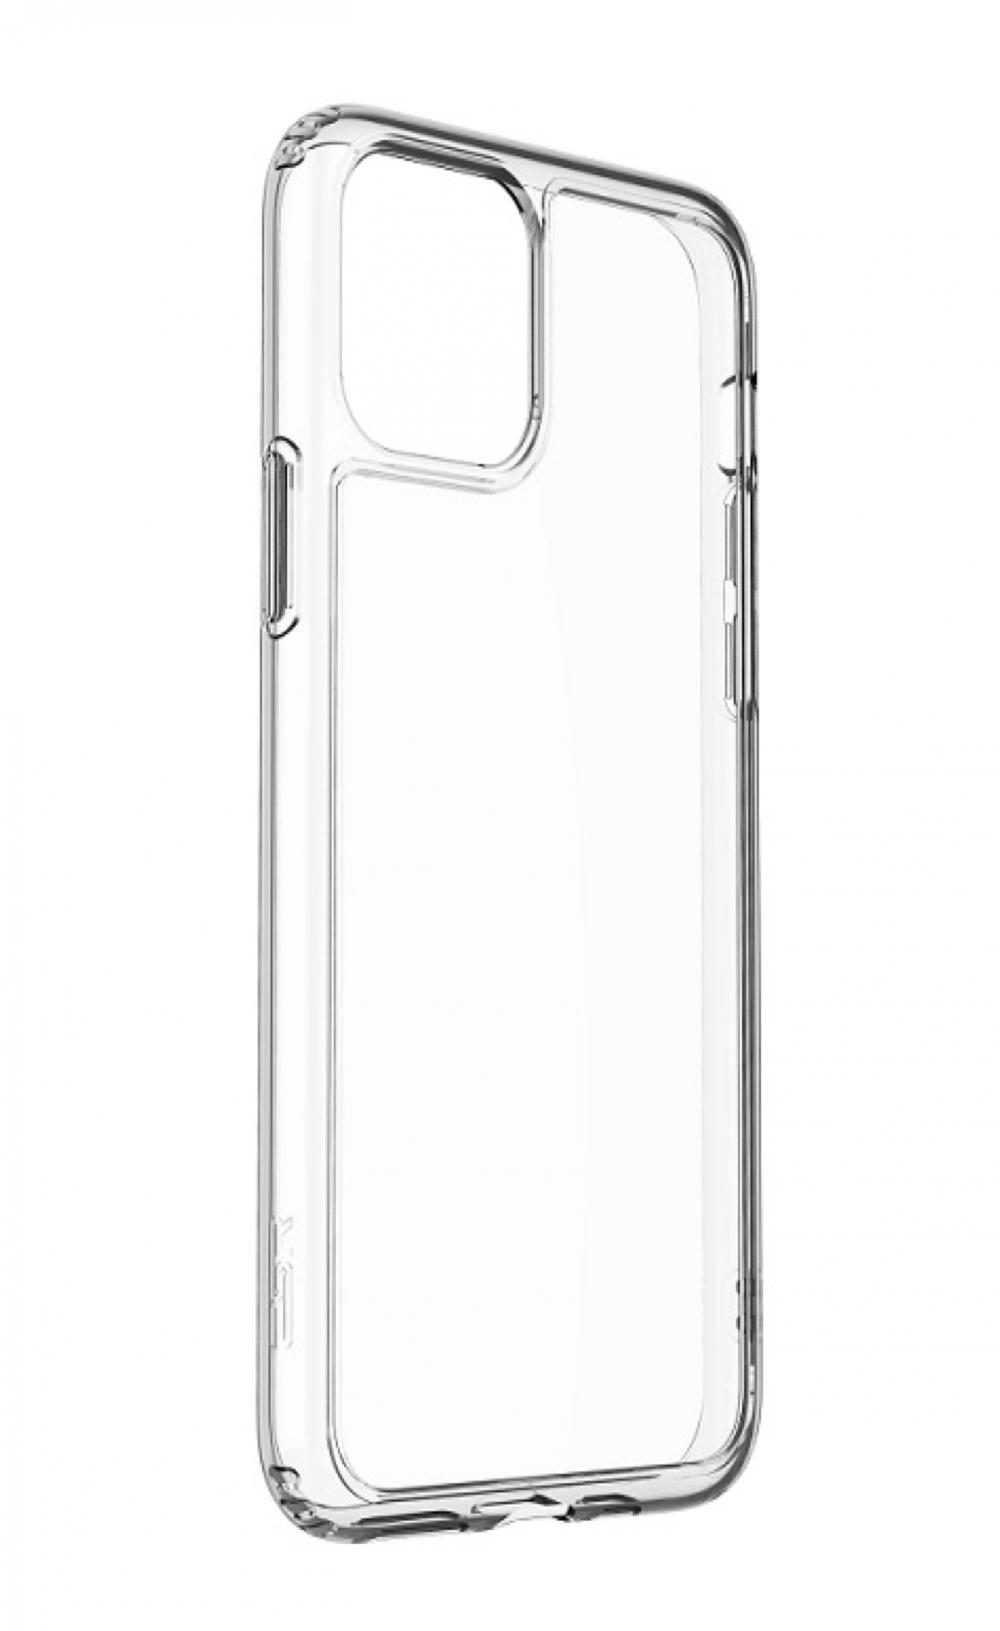 Стеклянный чехол ESR Ice Shield Clear iPhone 11 Pro